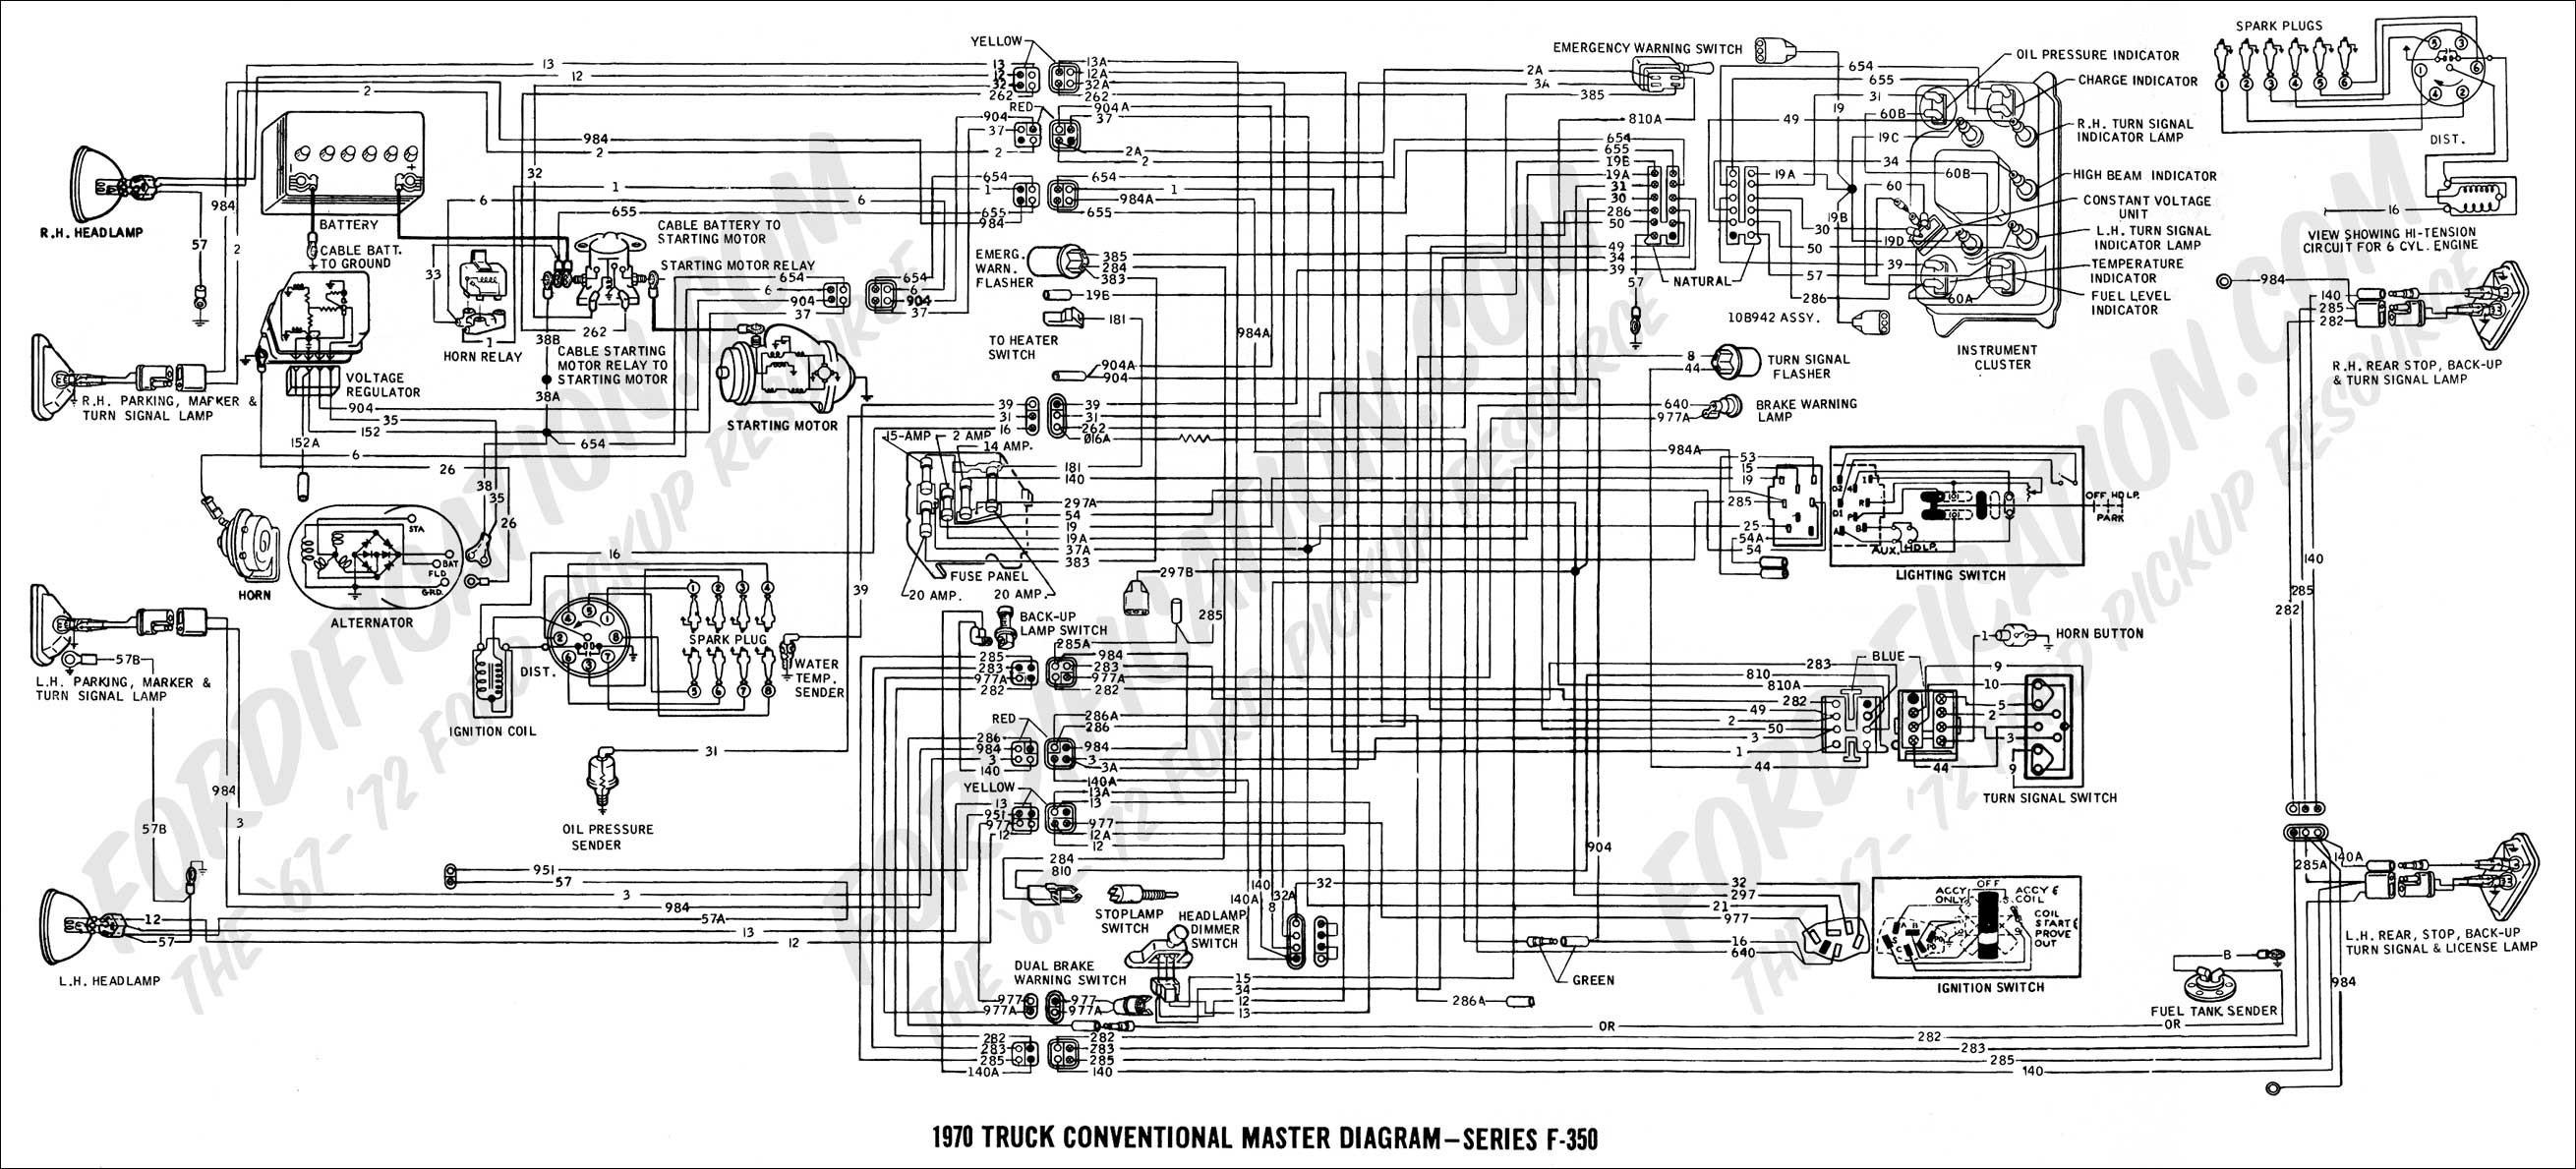 2000 Mazda Protege Engine Diagram 2000 Bronco Wiring Diagram Another Blog About Wiring Diagram • Of 2000 Mazda Protege Engine Diagram